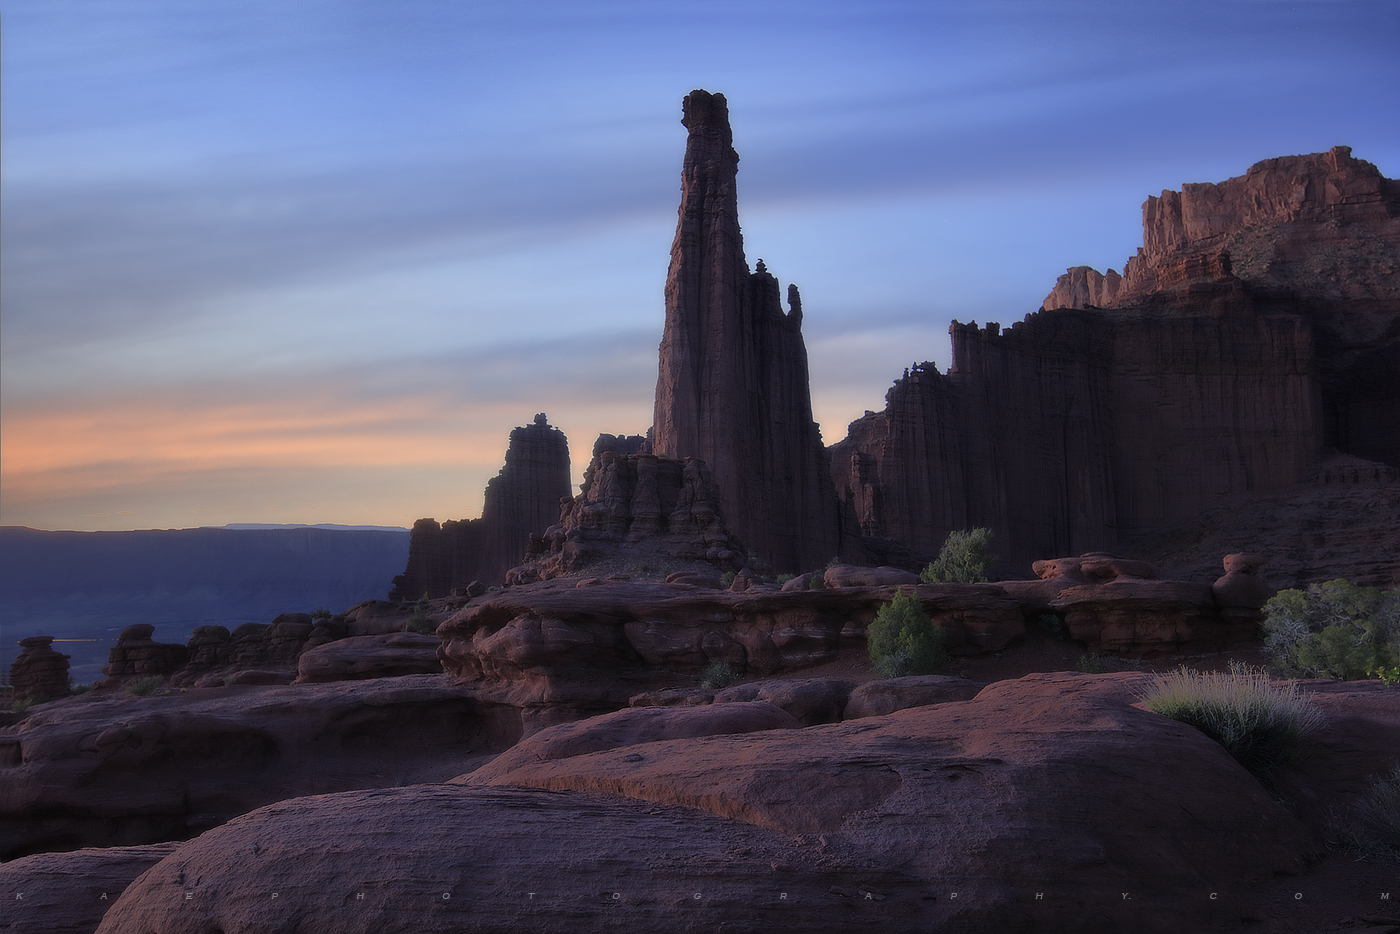 titan, fisher towers, utah, photo